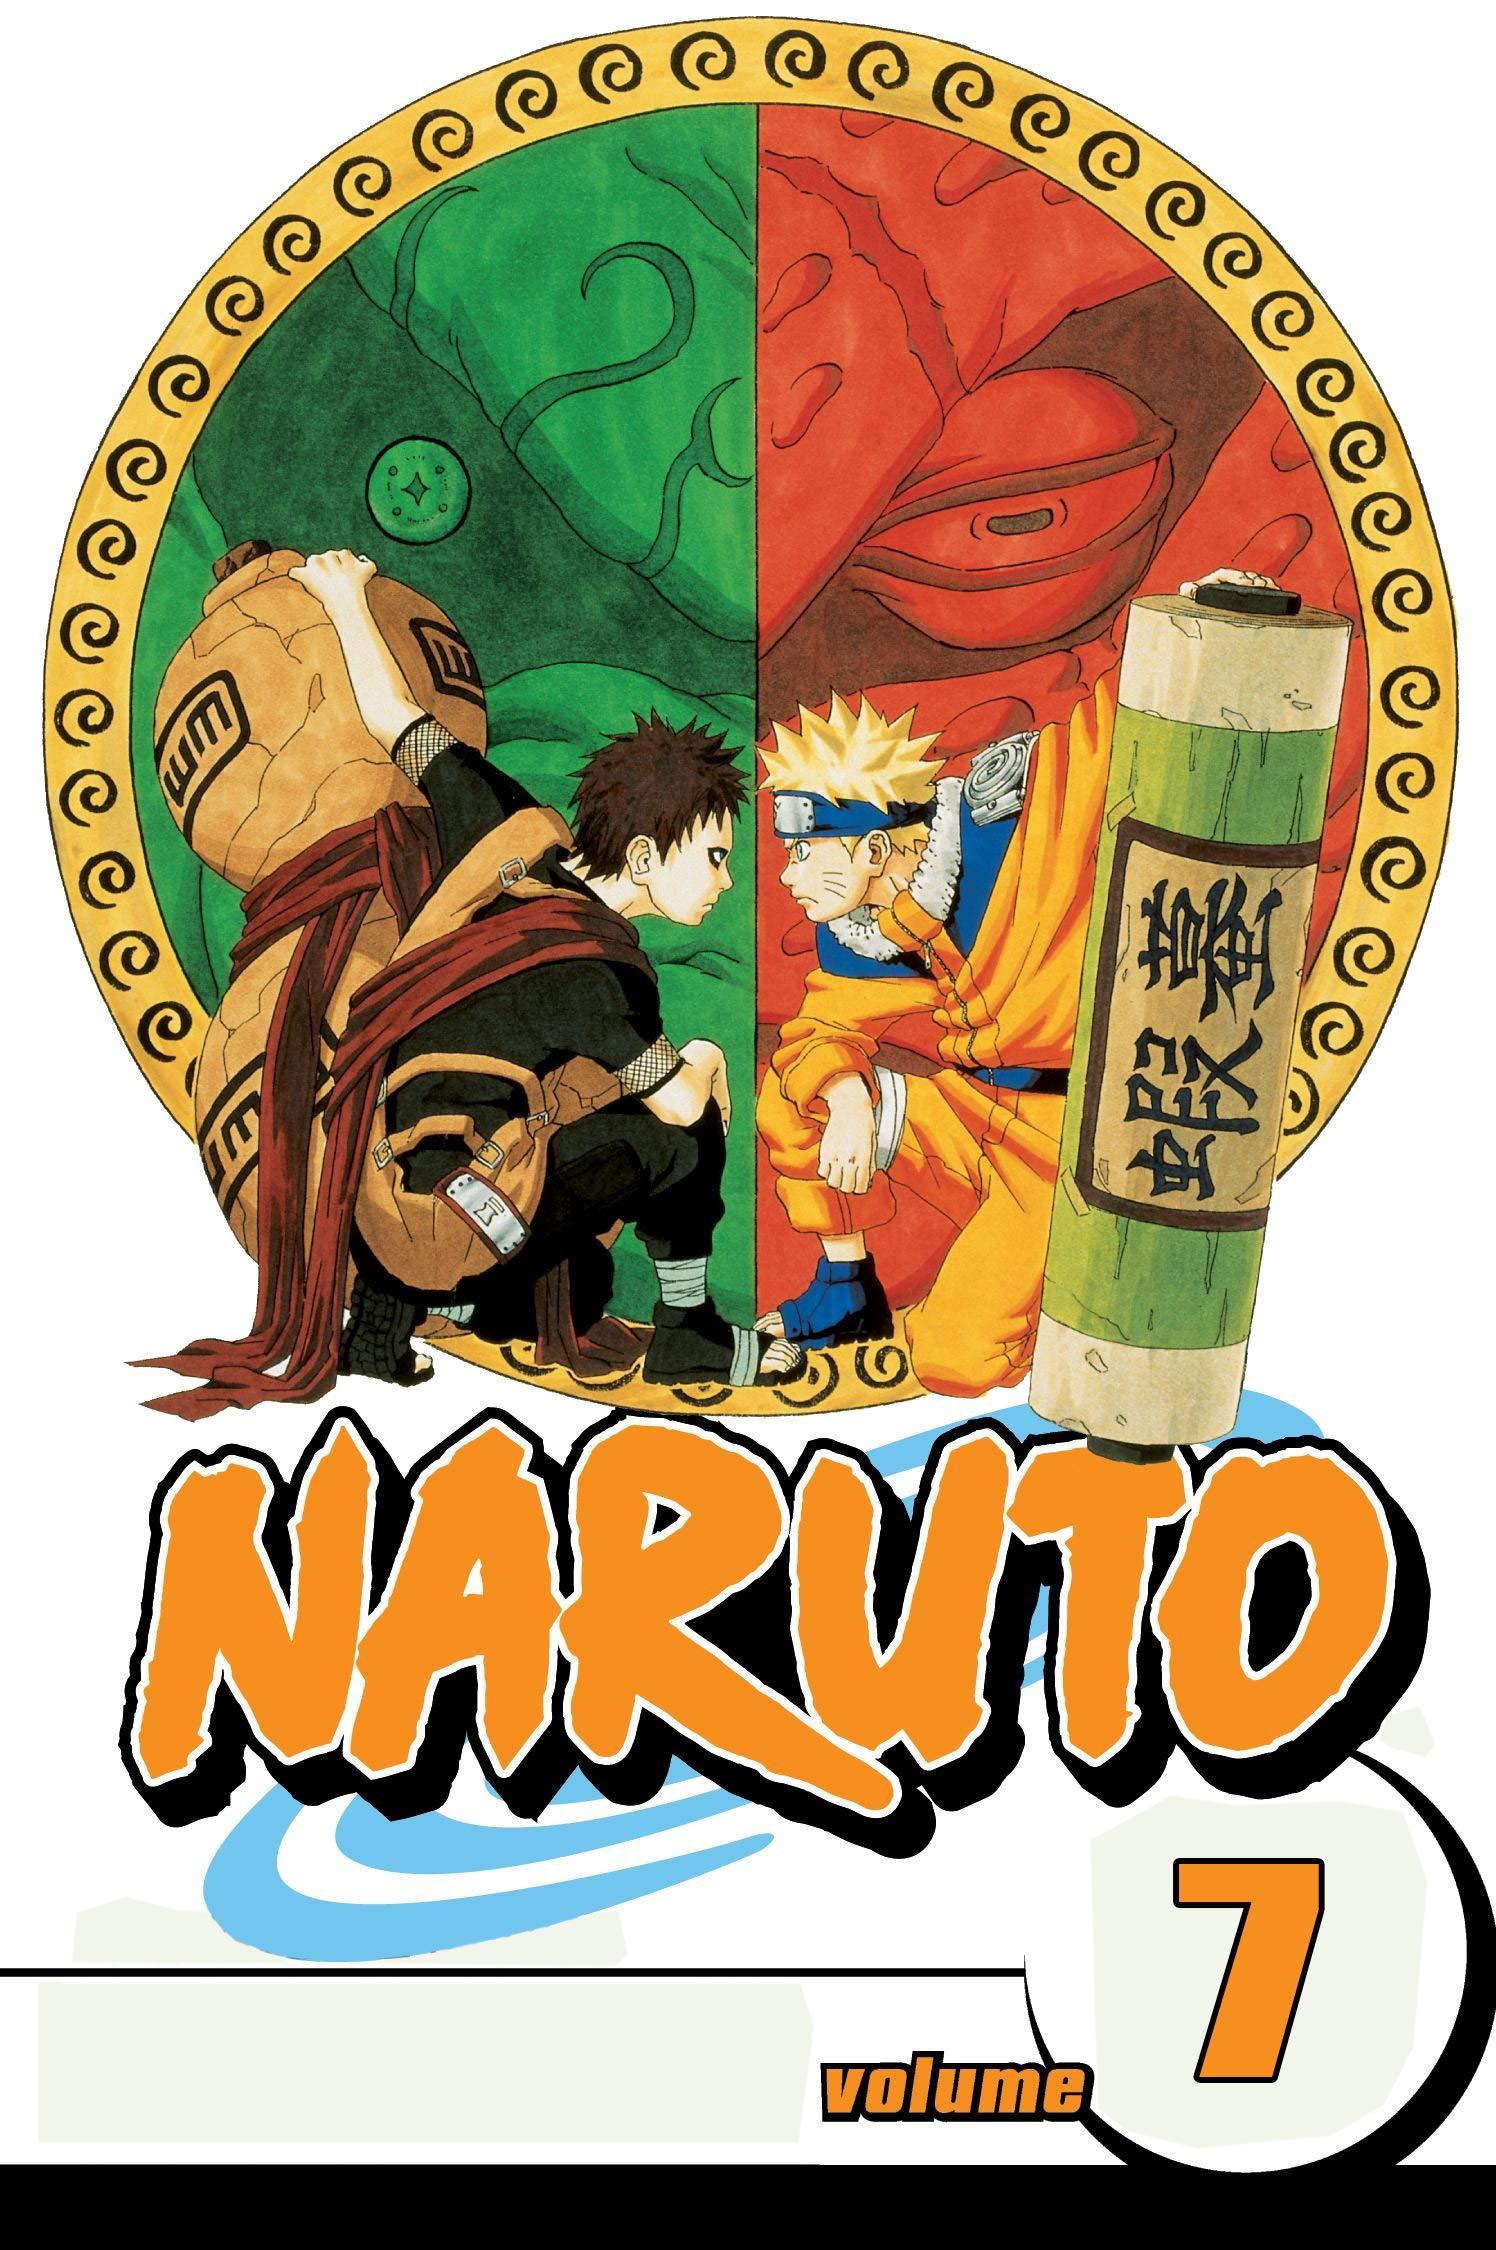 New Manga Full Color: Naruto Volume 7